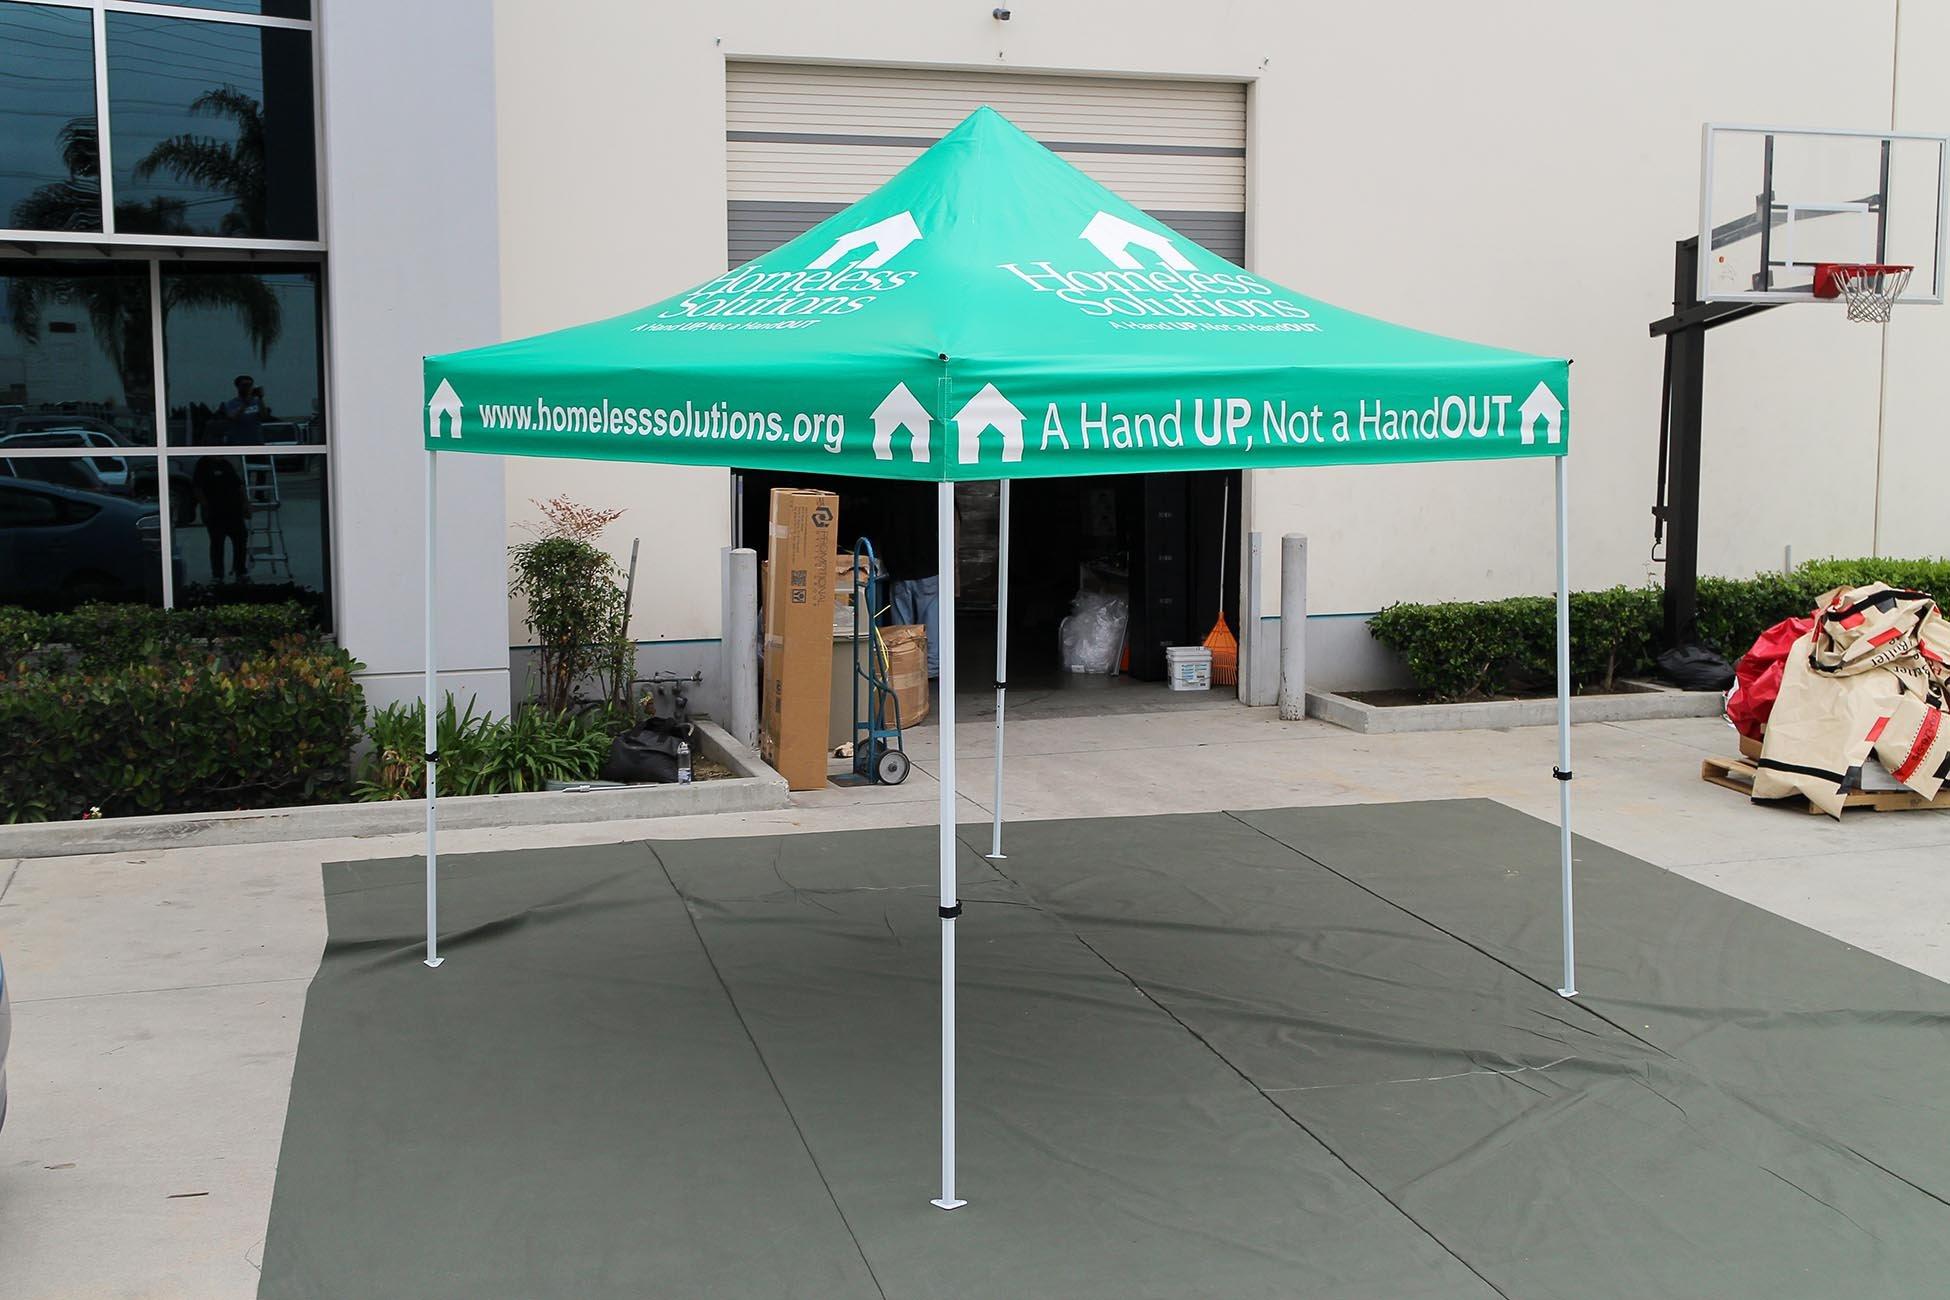 homeless-solutions-pop-up